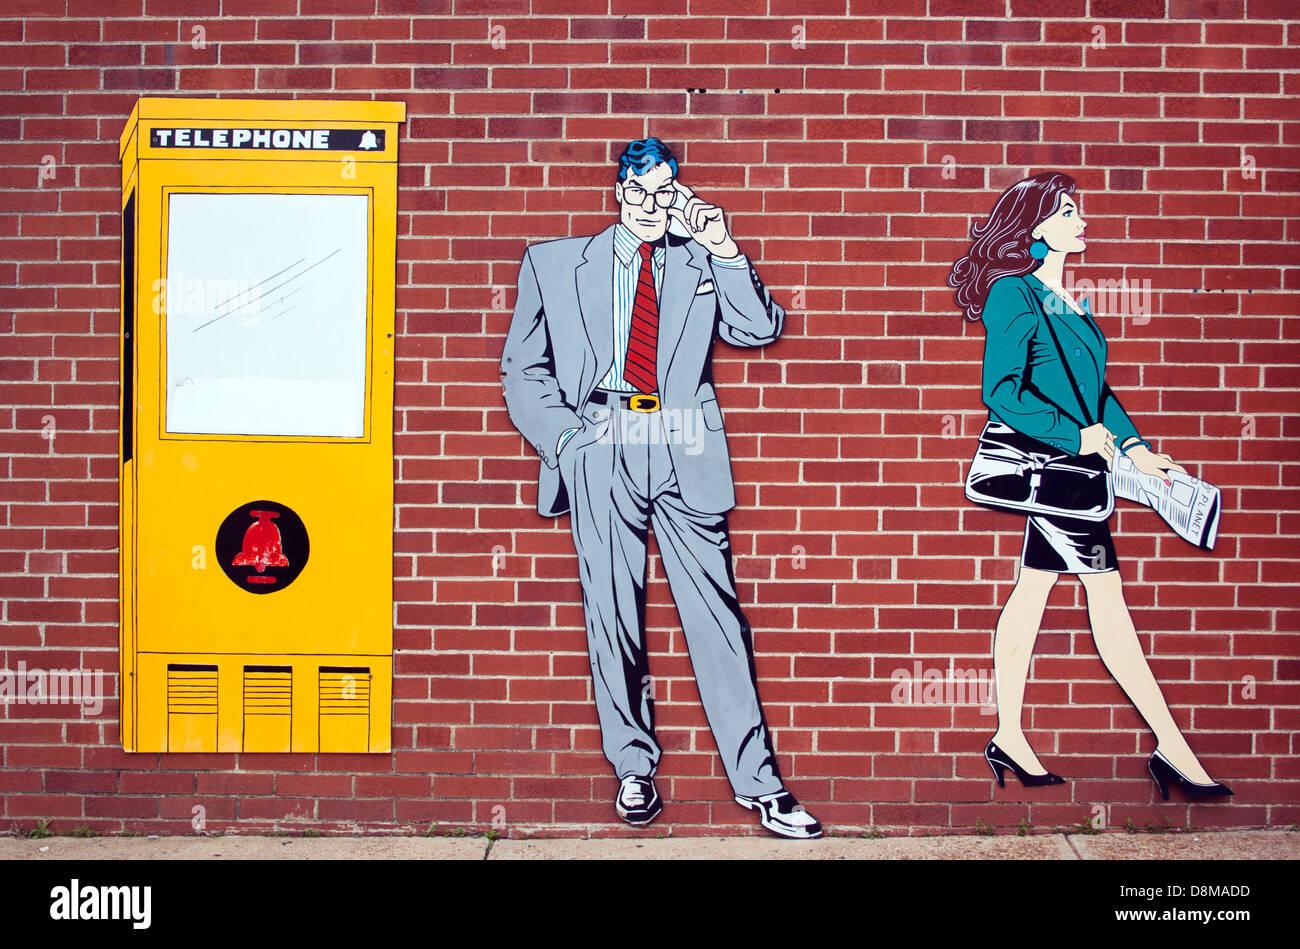 Metropolis Illinois Home of Superman painting on a brick wall - Stock Image